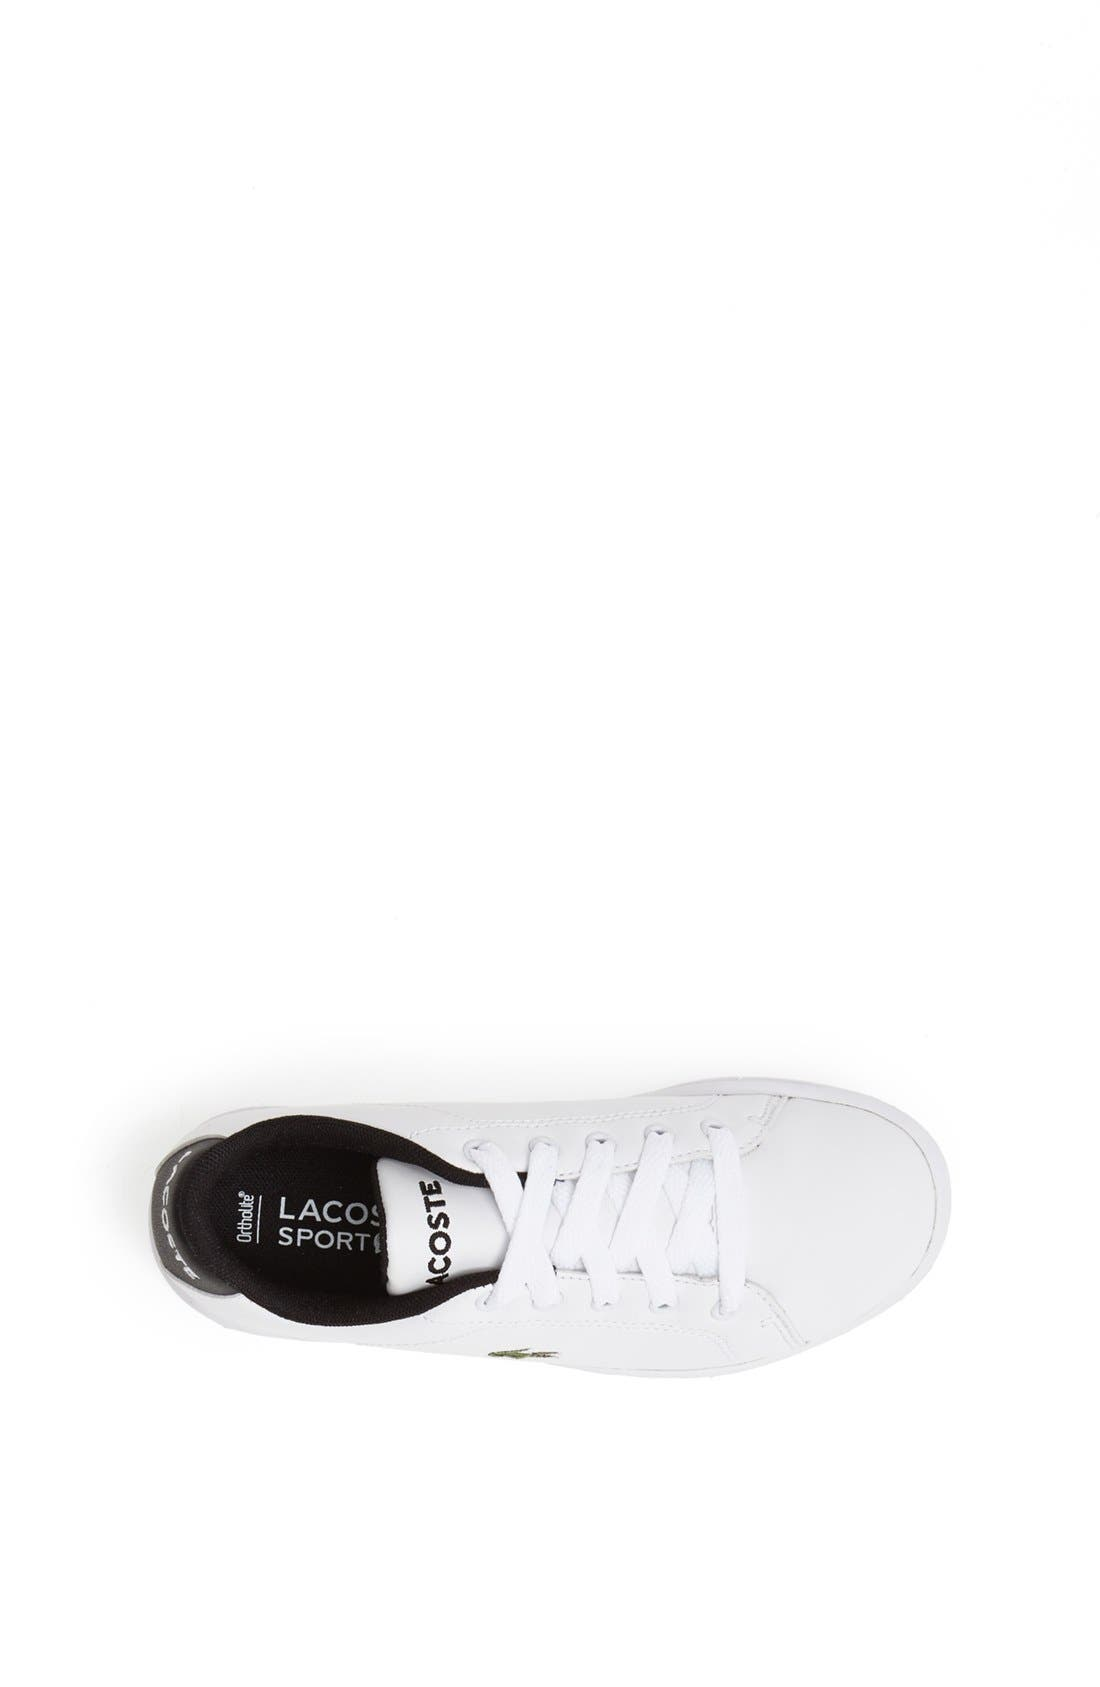 Alternate Image 3  - Lacoste 'Carnaby' Sneaker (Baby, Walker, Toddler, Little Kid & Big Kid)